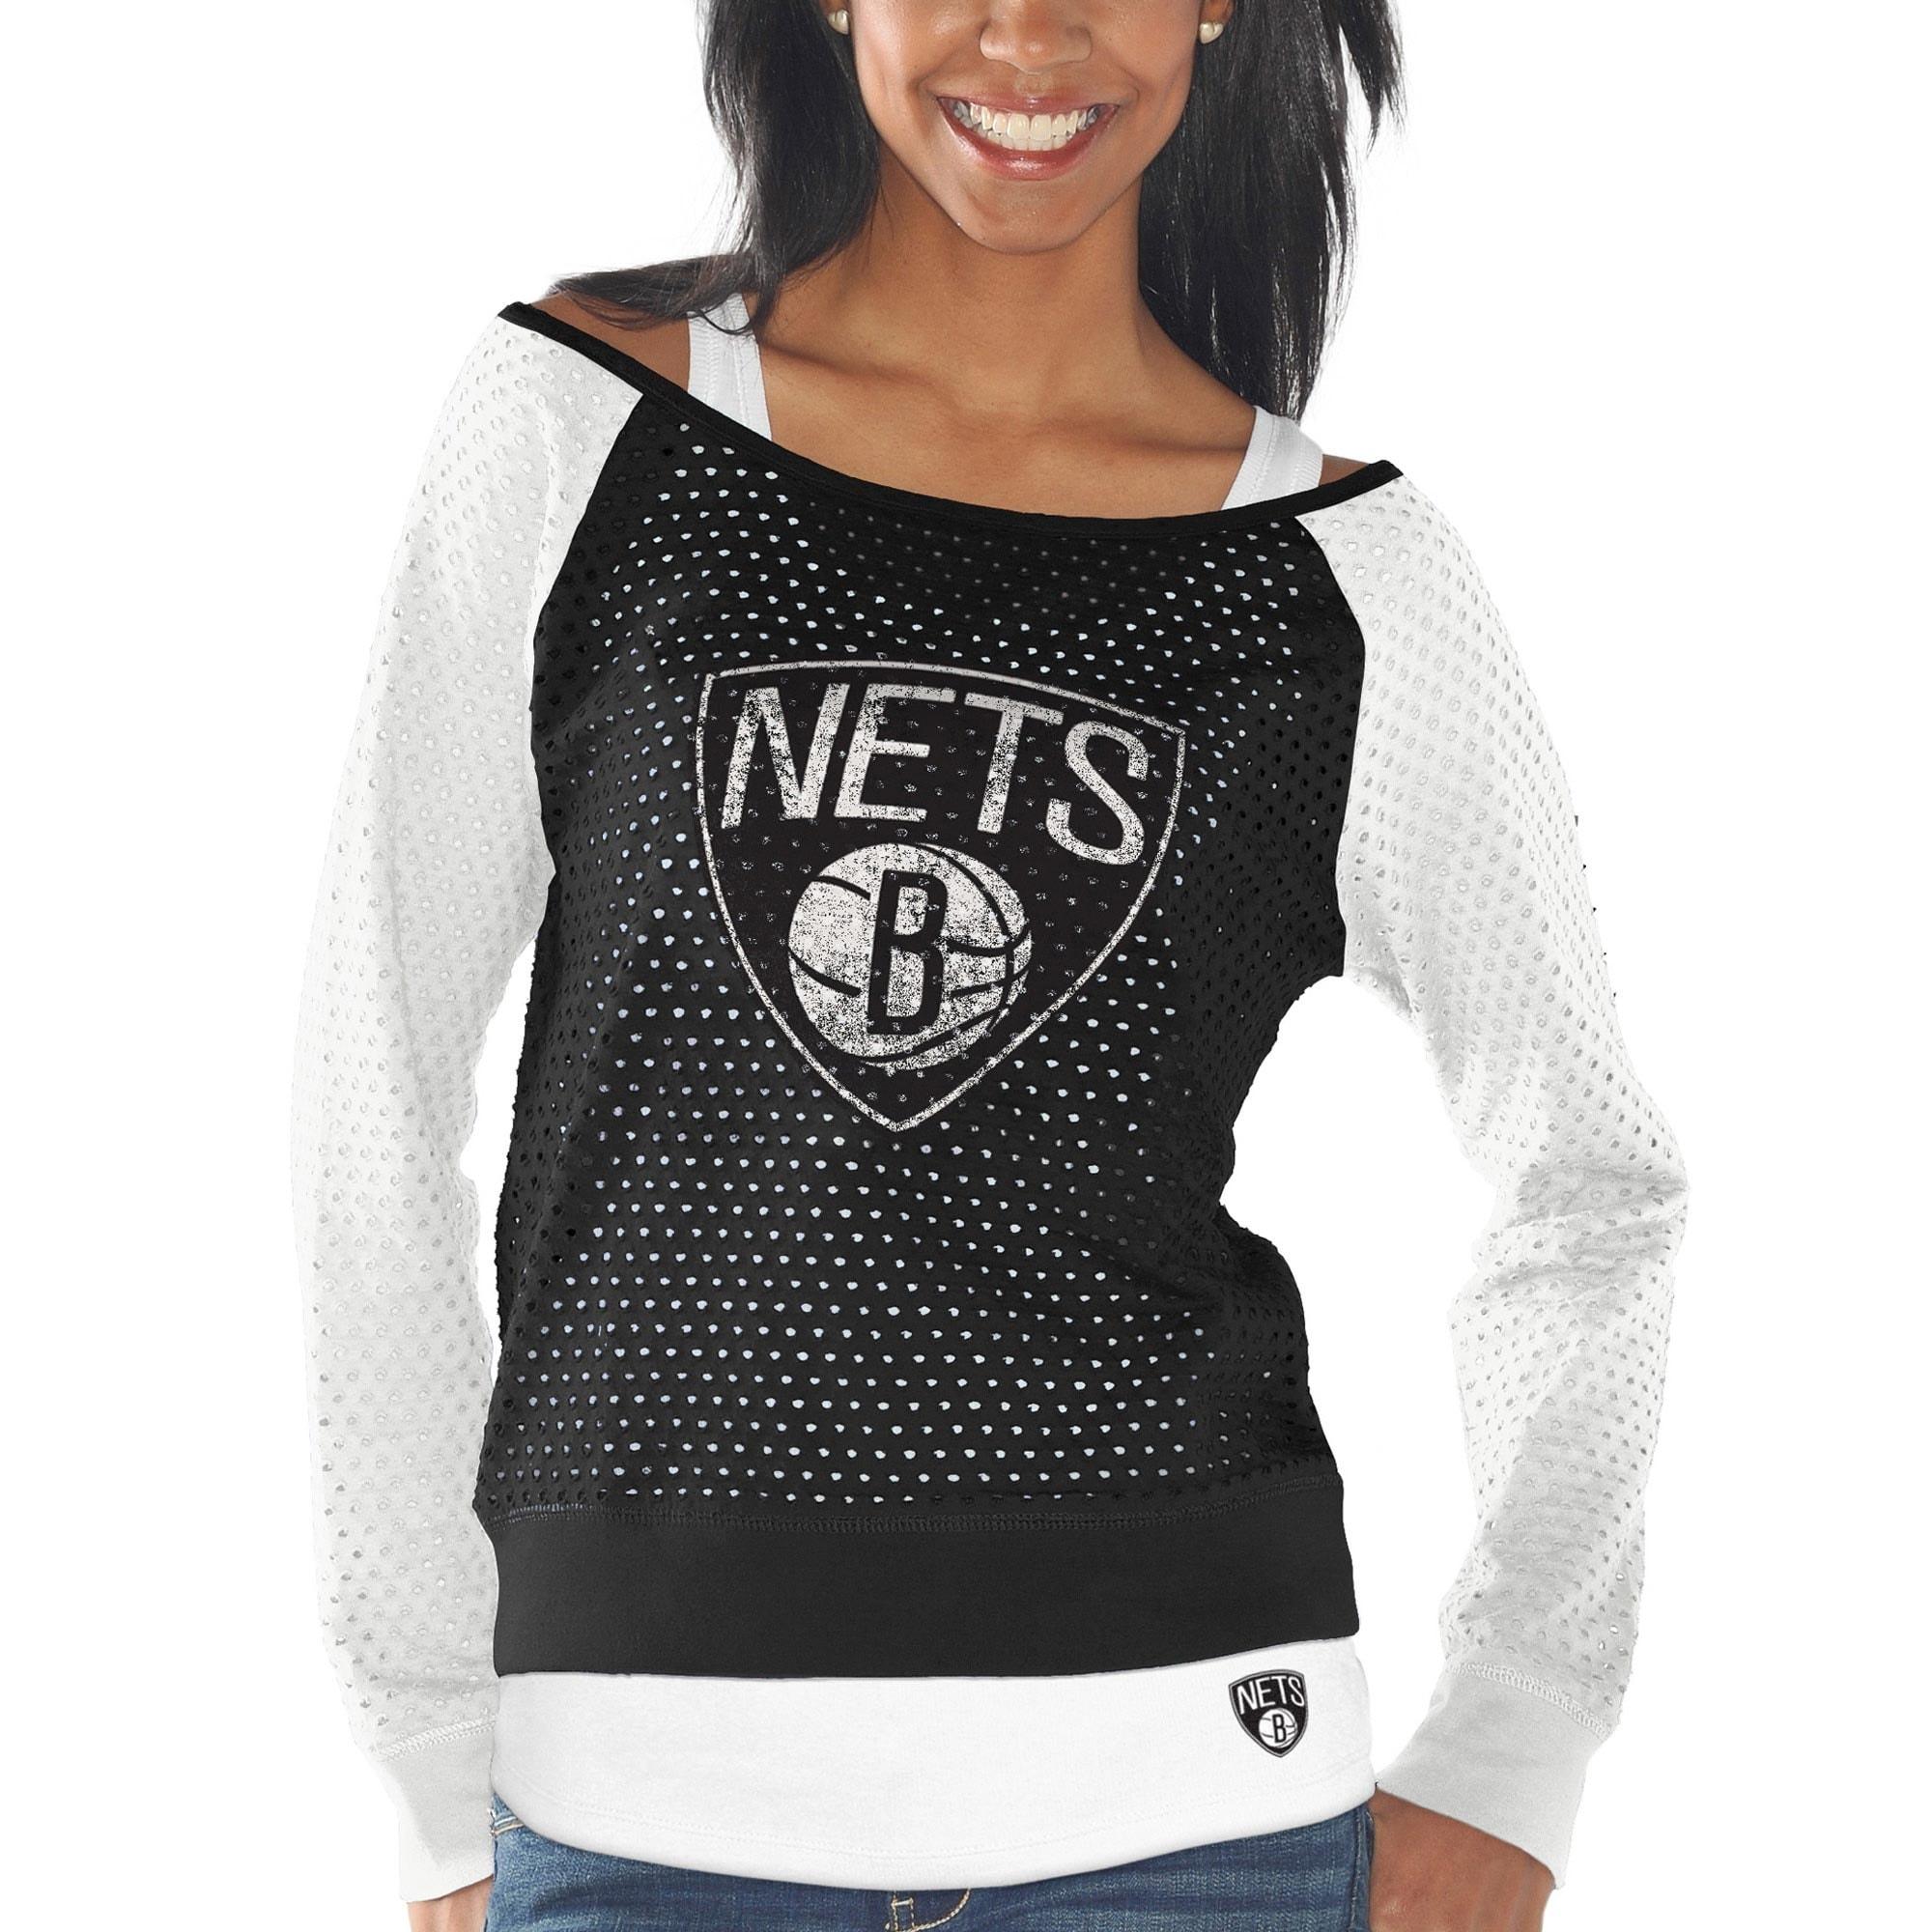 Brooklyn Nets Women's Holy Raglan Long Sleeve Top and Tank Top Set - Black